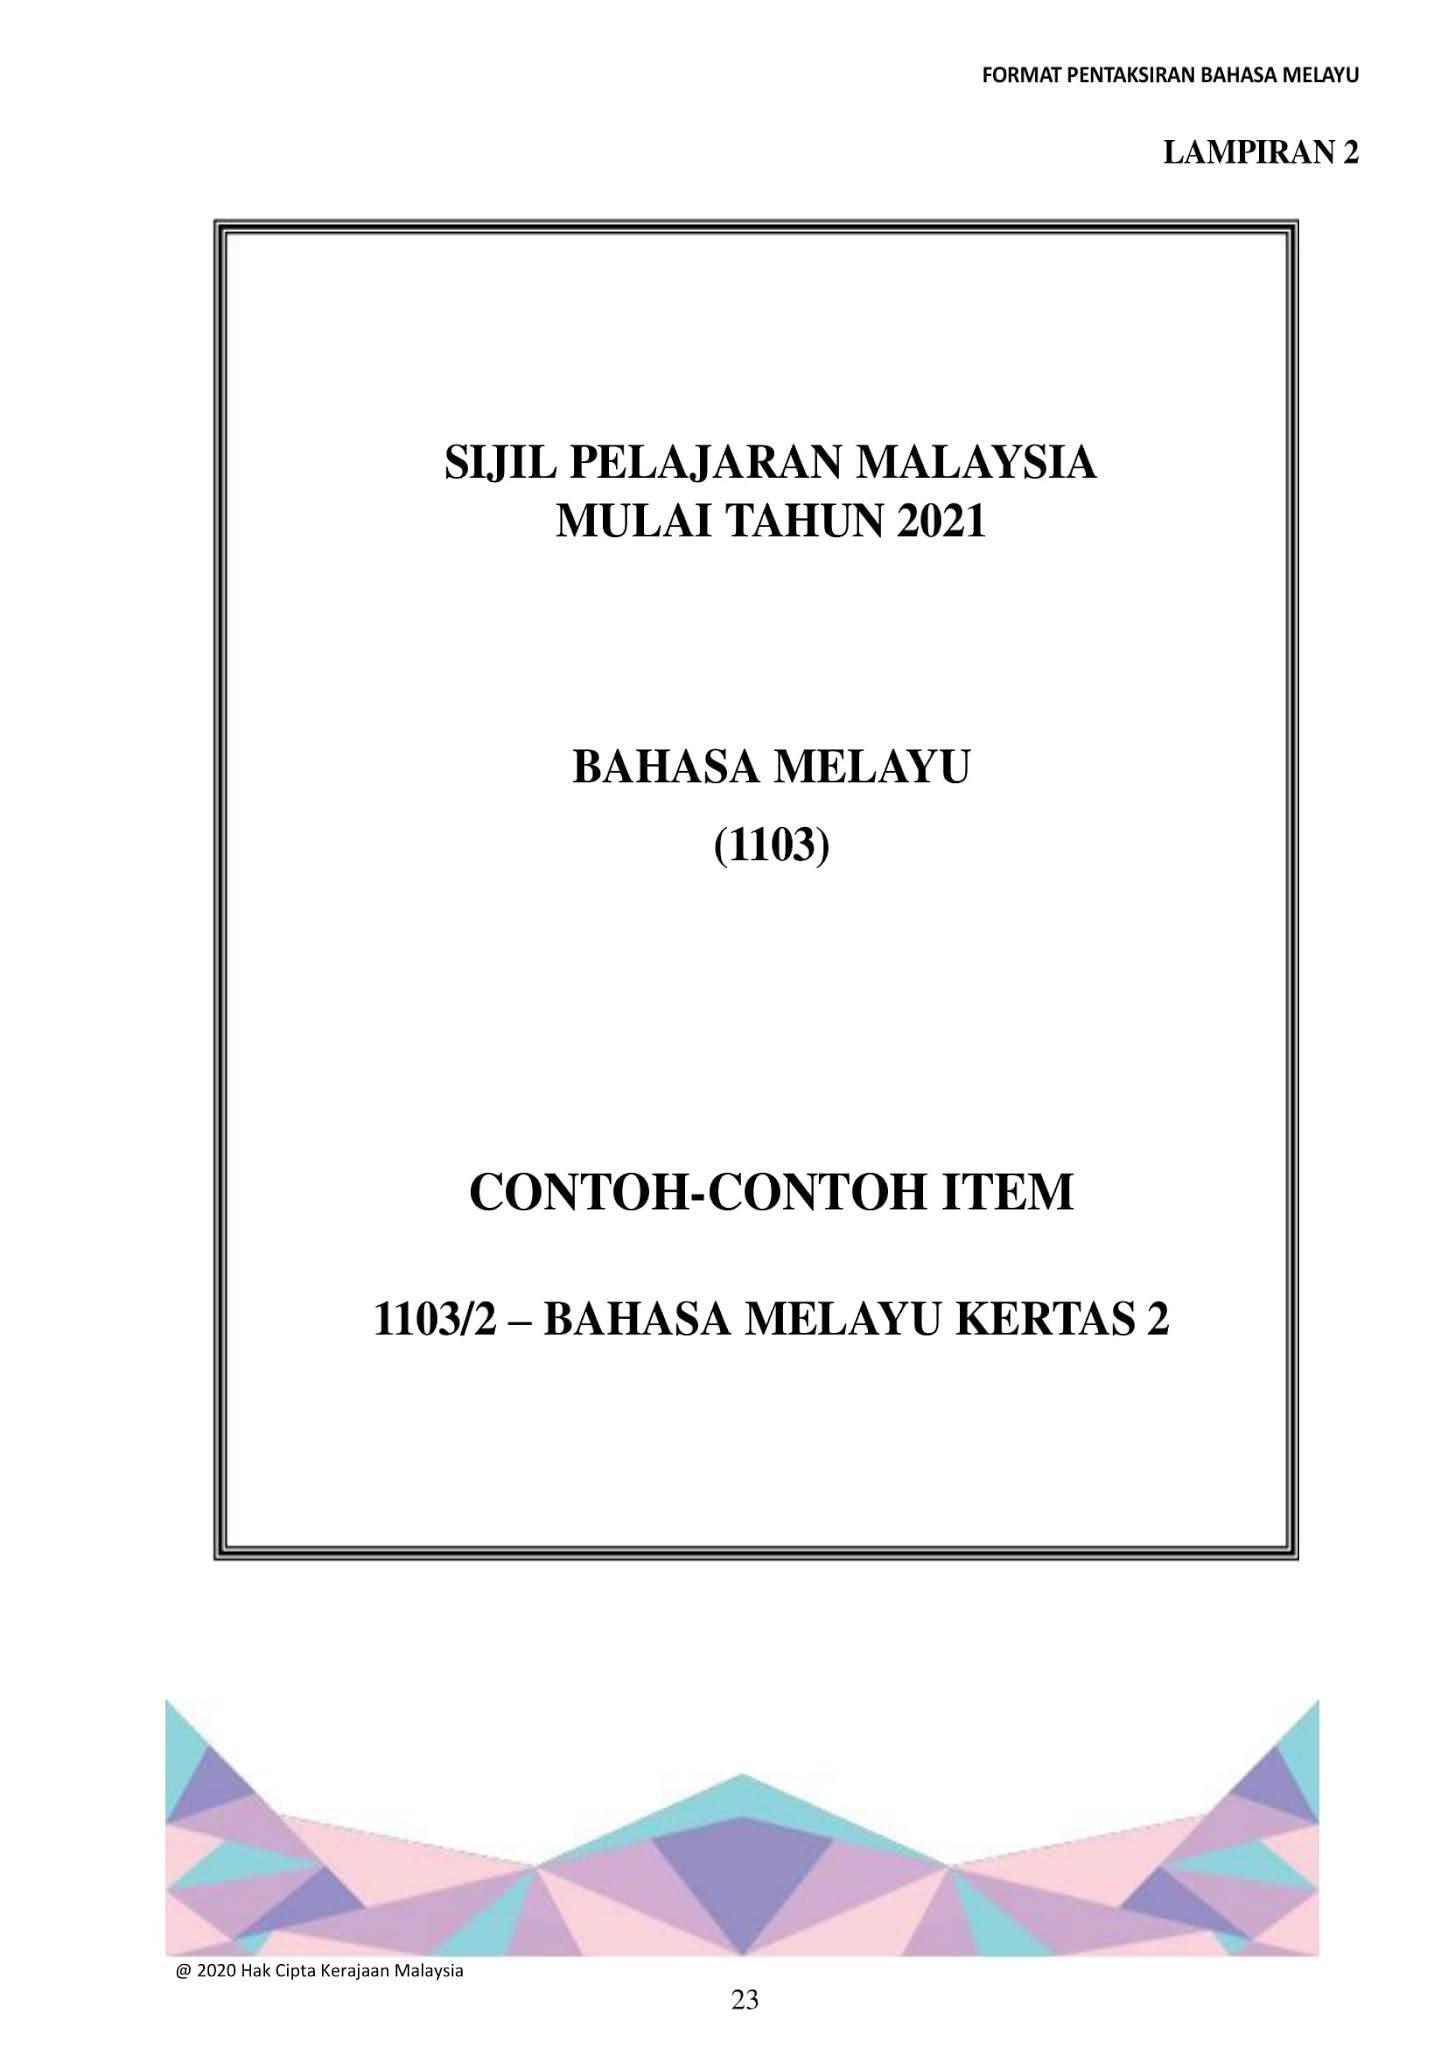 spm format pentaksiran bahasa melayu kod 1103 sijil pelajaran malaysia mulai 2021 cikgu share spm format pentaksiran bahasa melayu